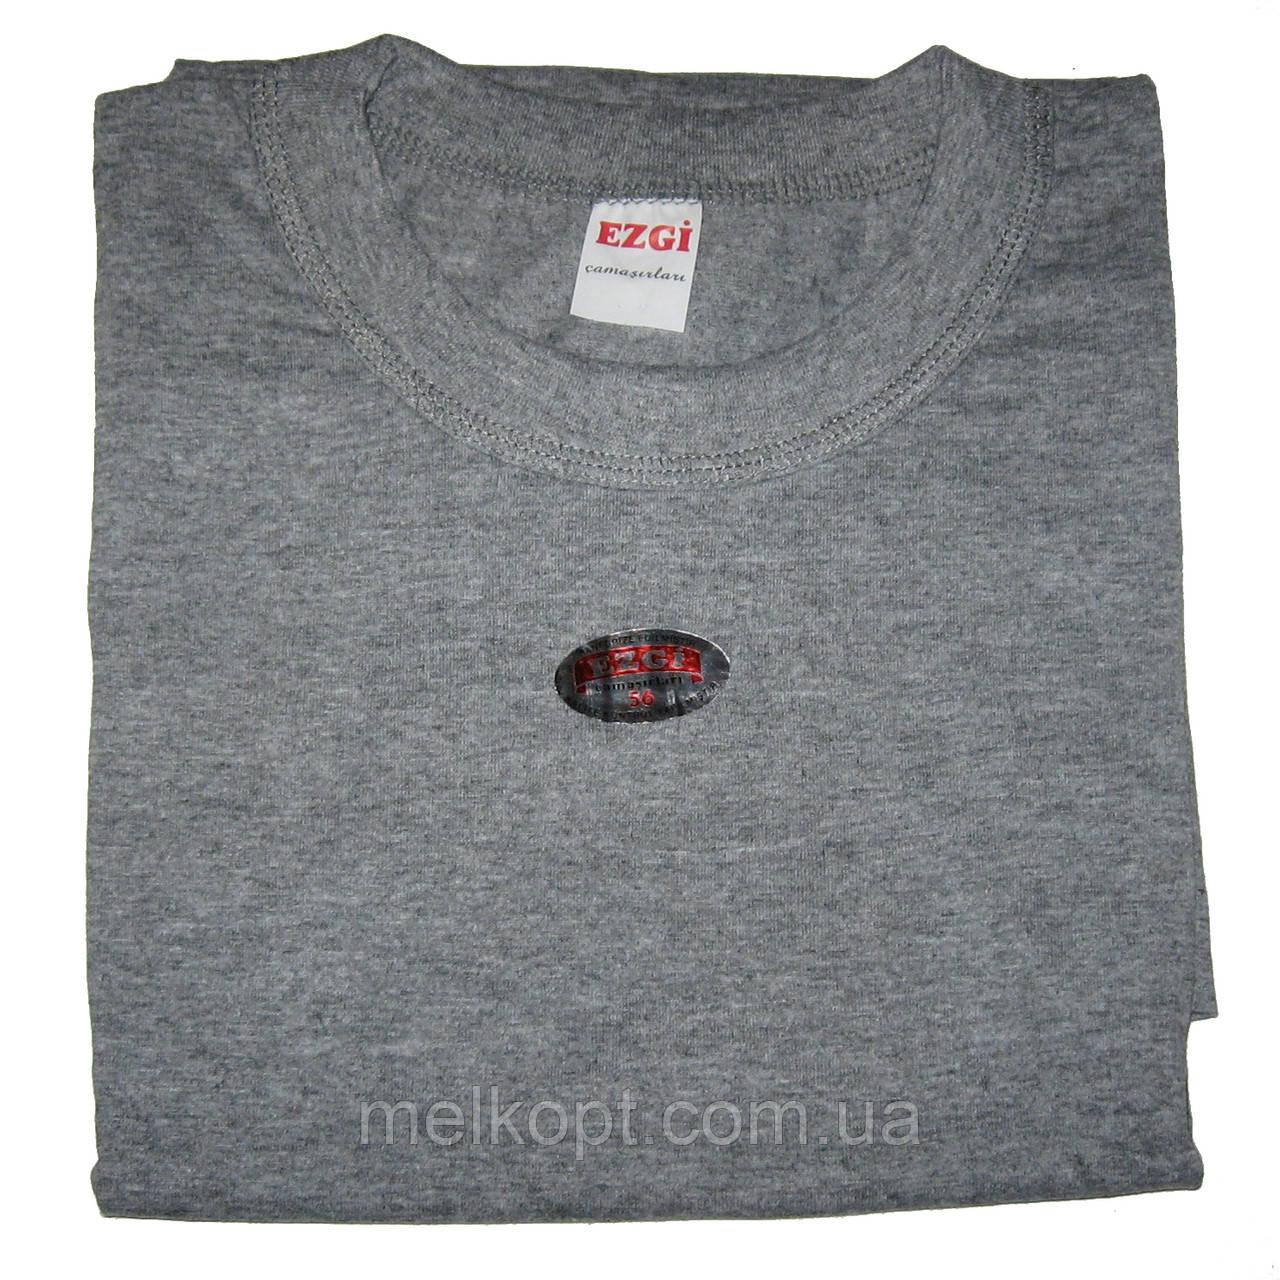 Мужские футболки Ezgi - 67,00 грн./шт. (70-й размер, серые)